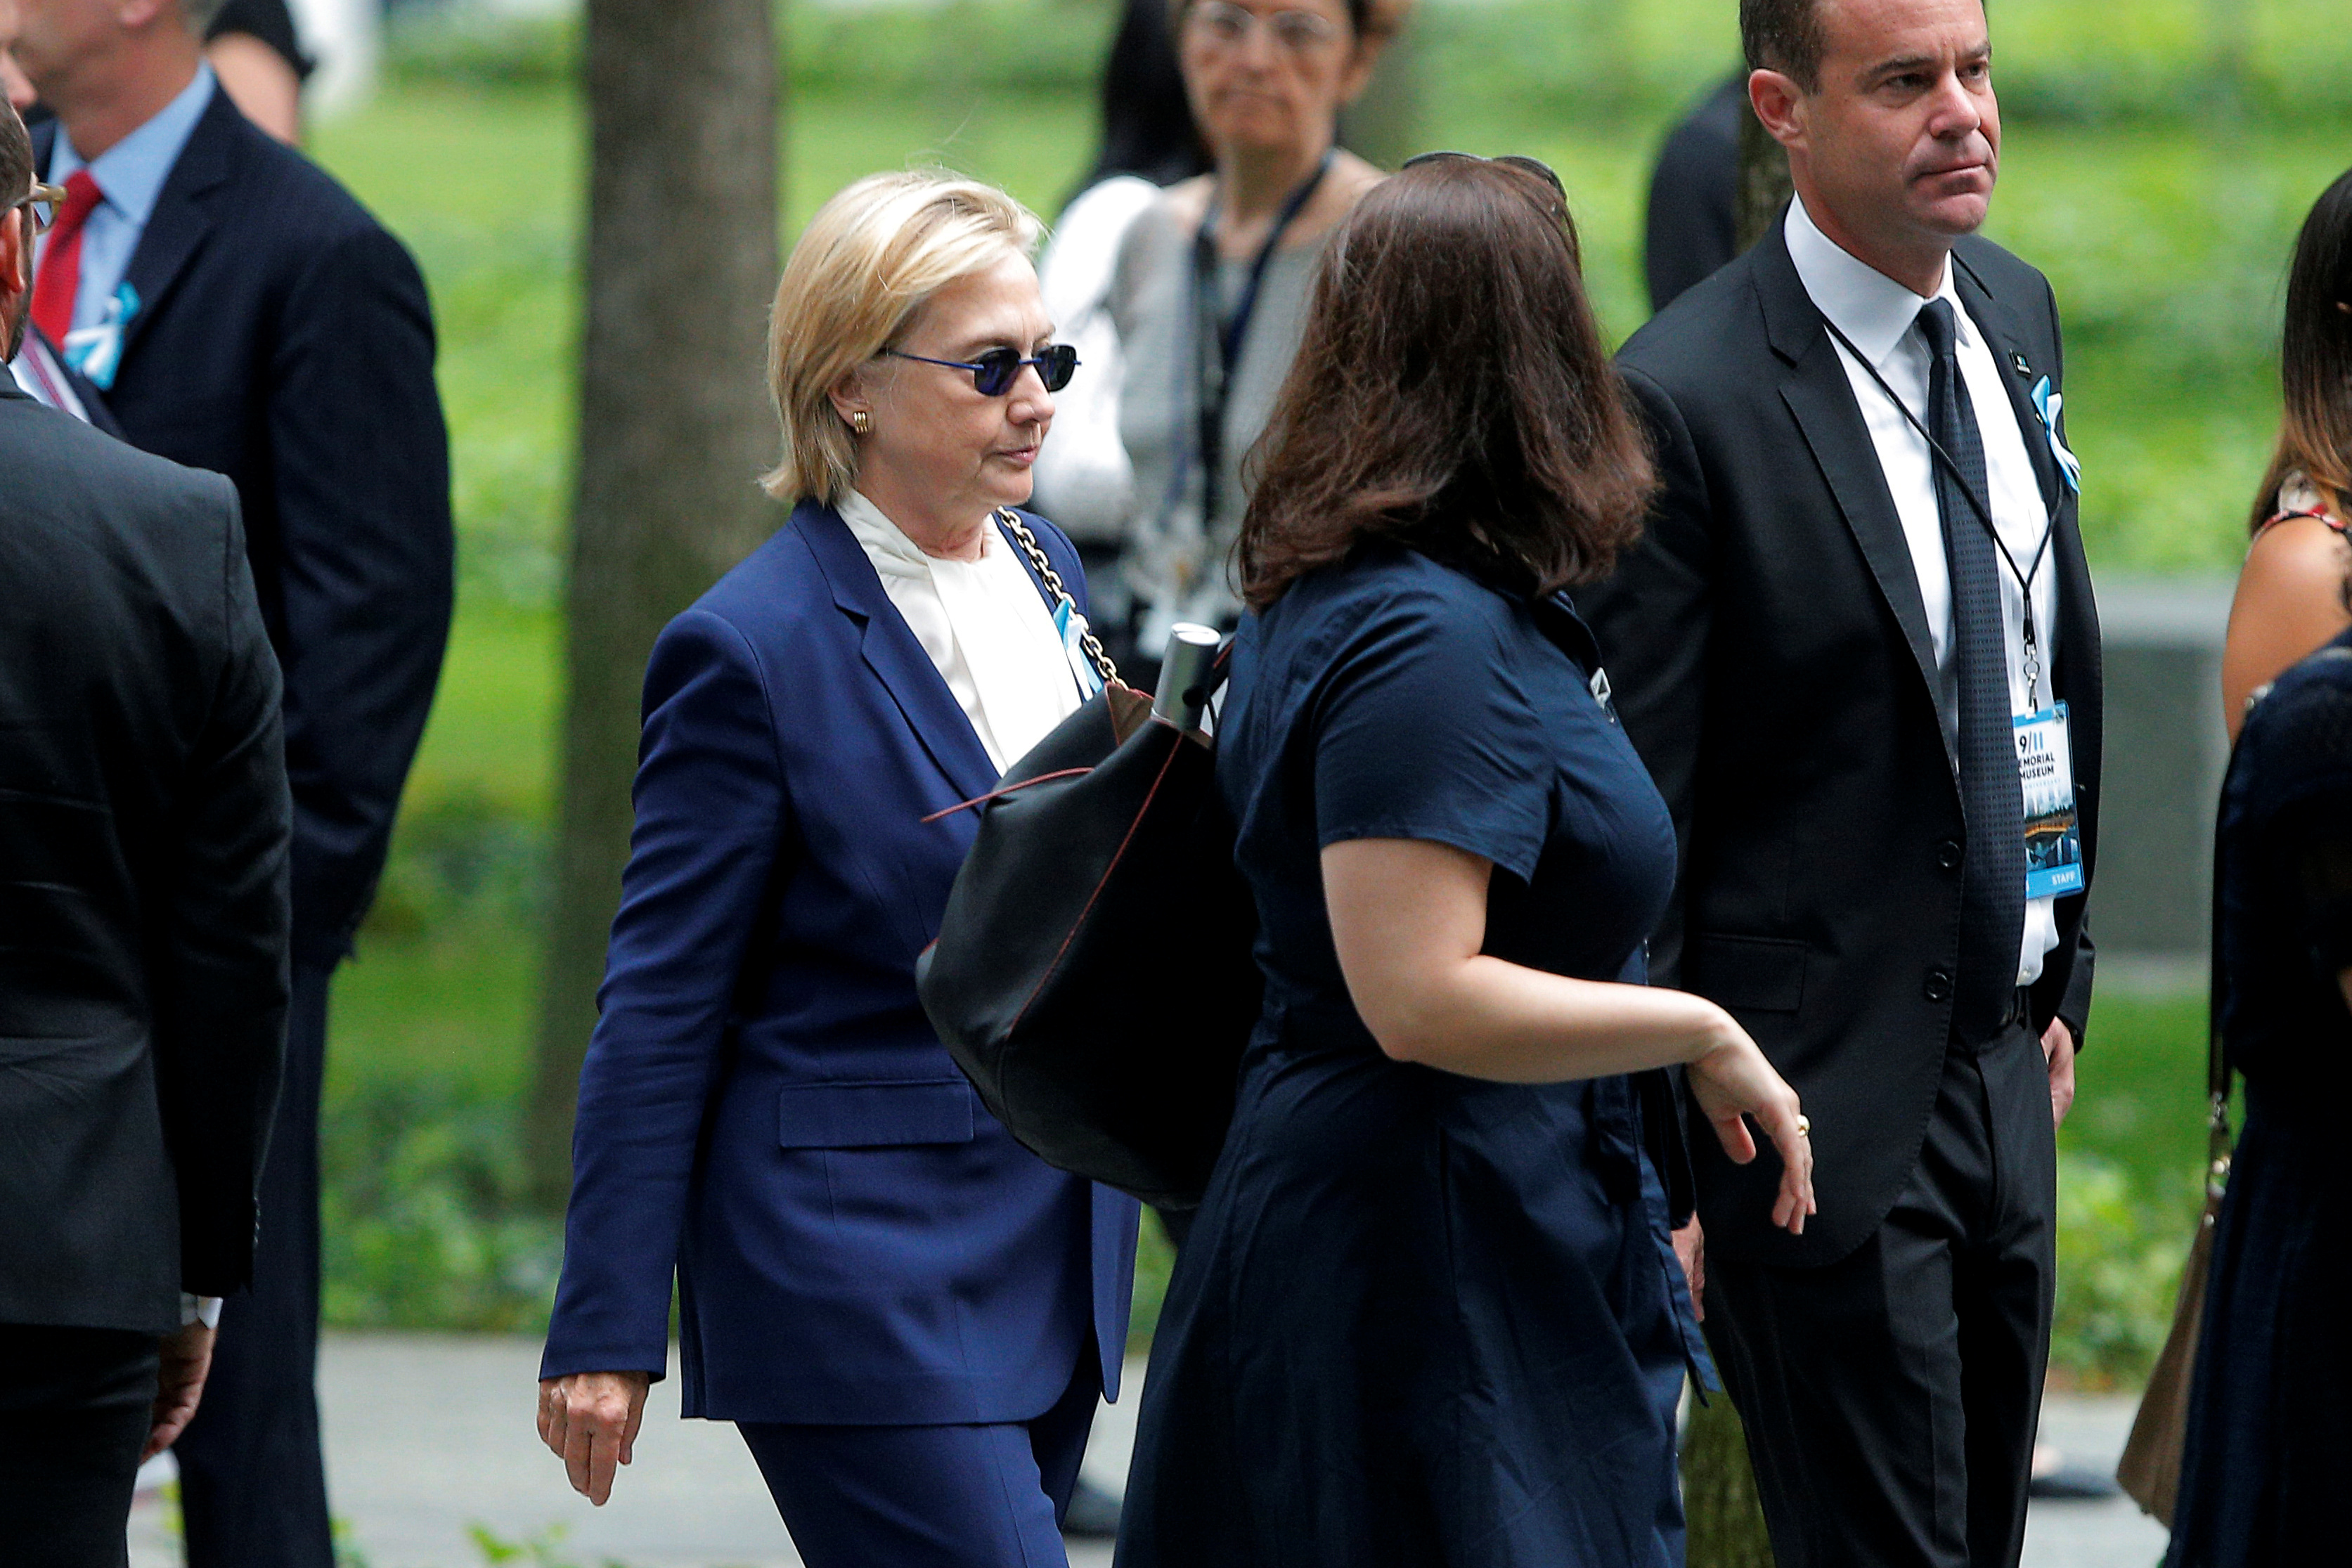 Hillary Clinton's pneumonia: Is she contagious?